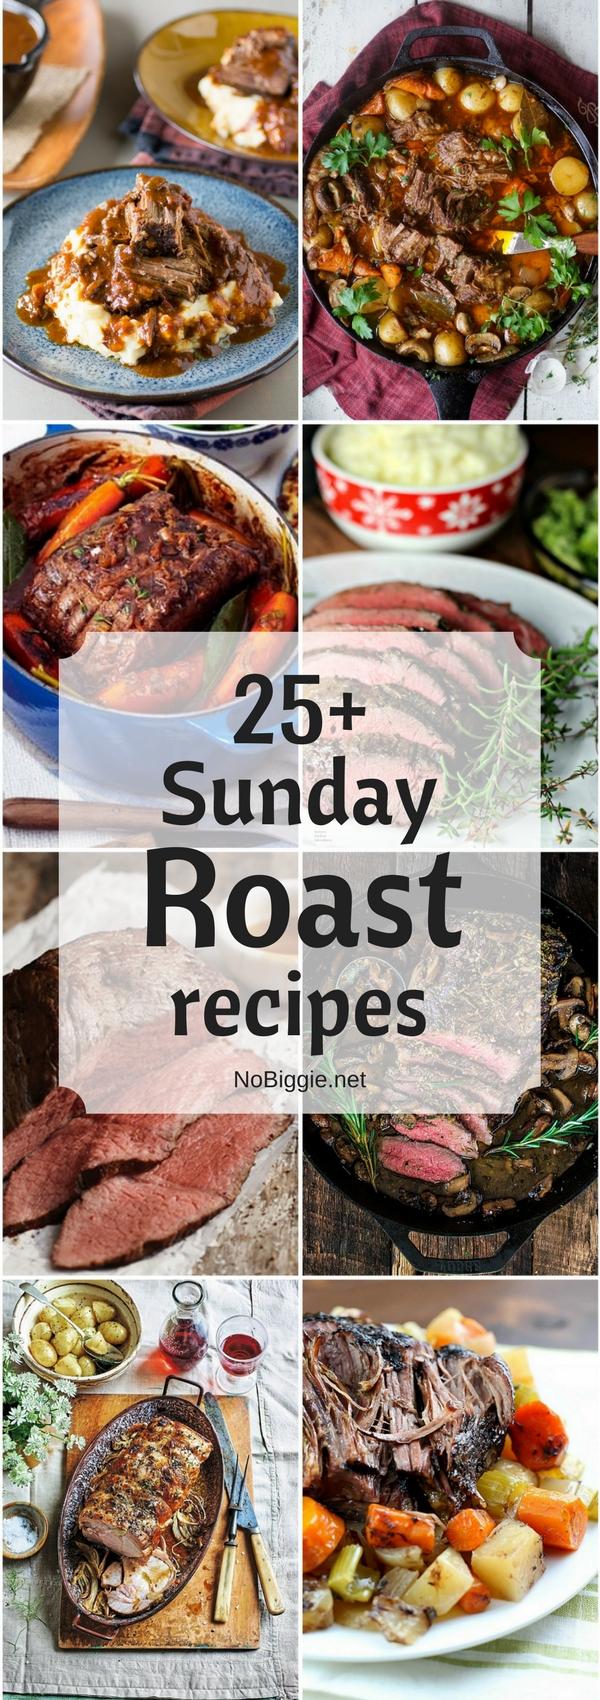 25+ Sunday Roast Recipes   NoBiggie.net